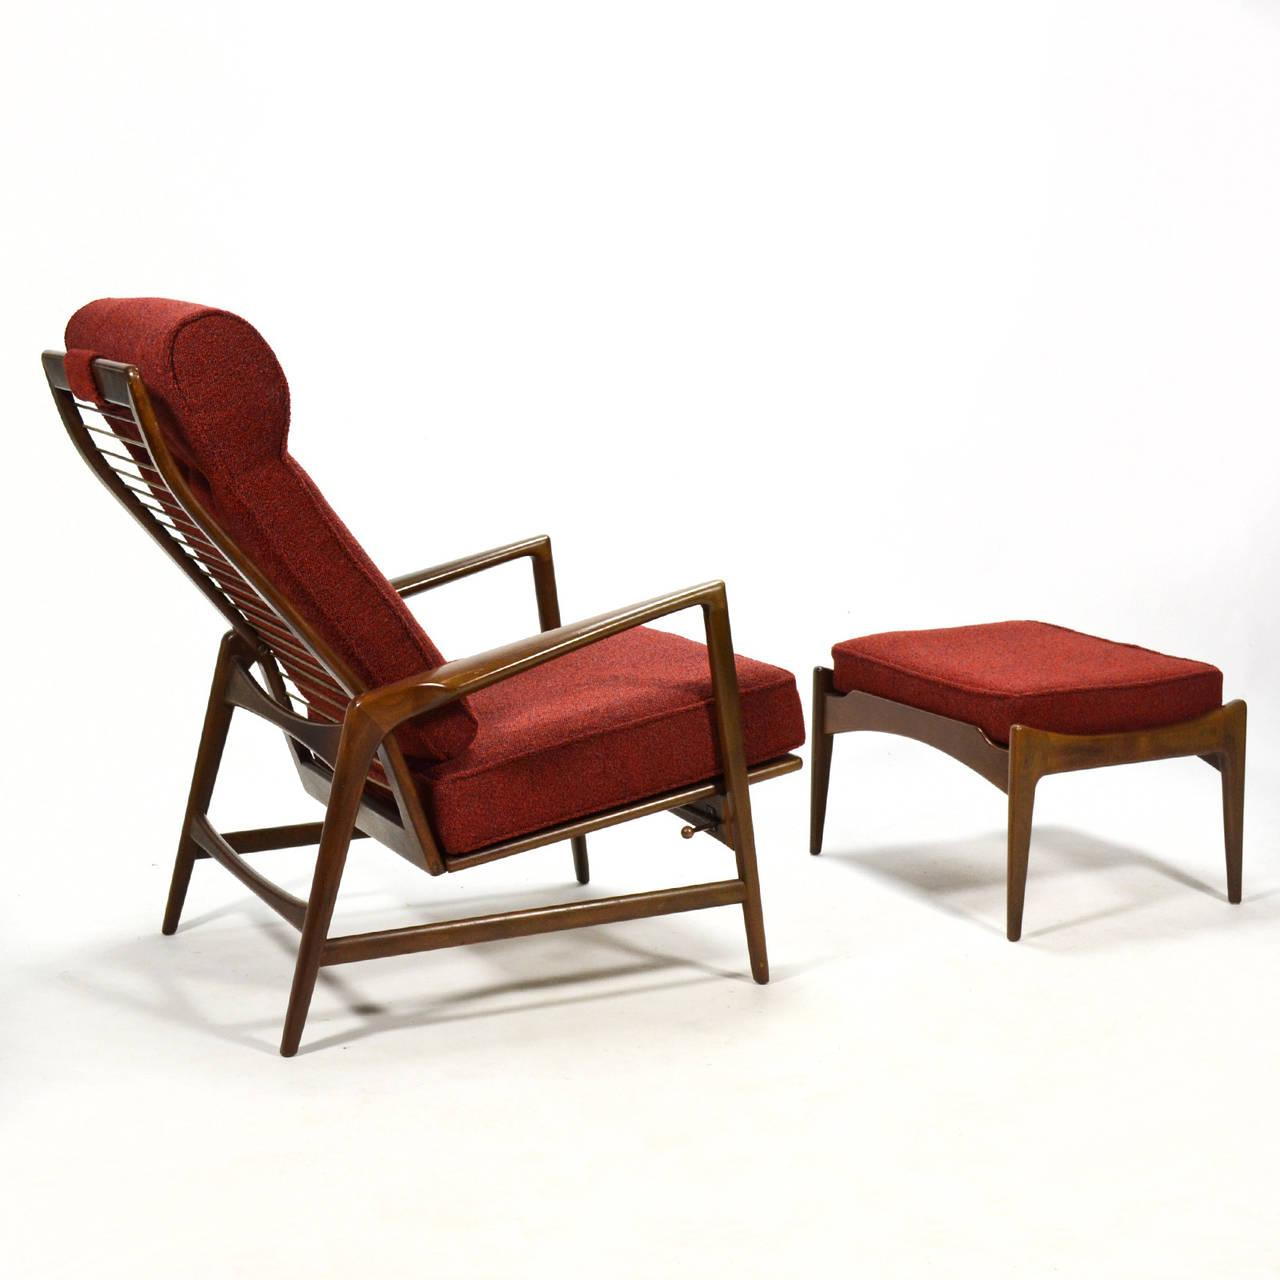 Ib Kofod Larsen Reclining Lounge Chair And Ottoman   Image 6 Of 10